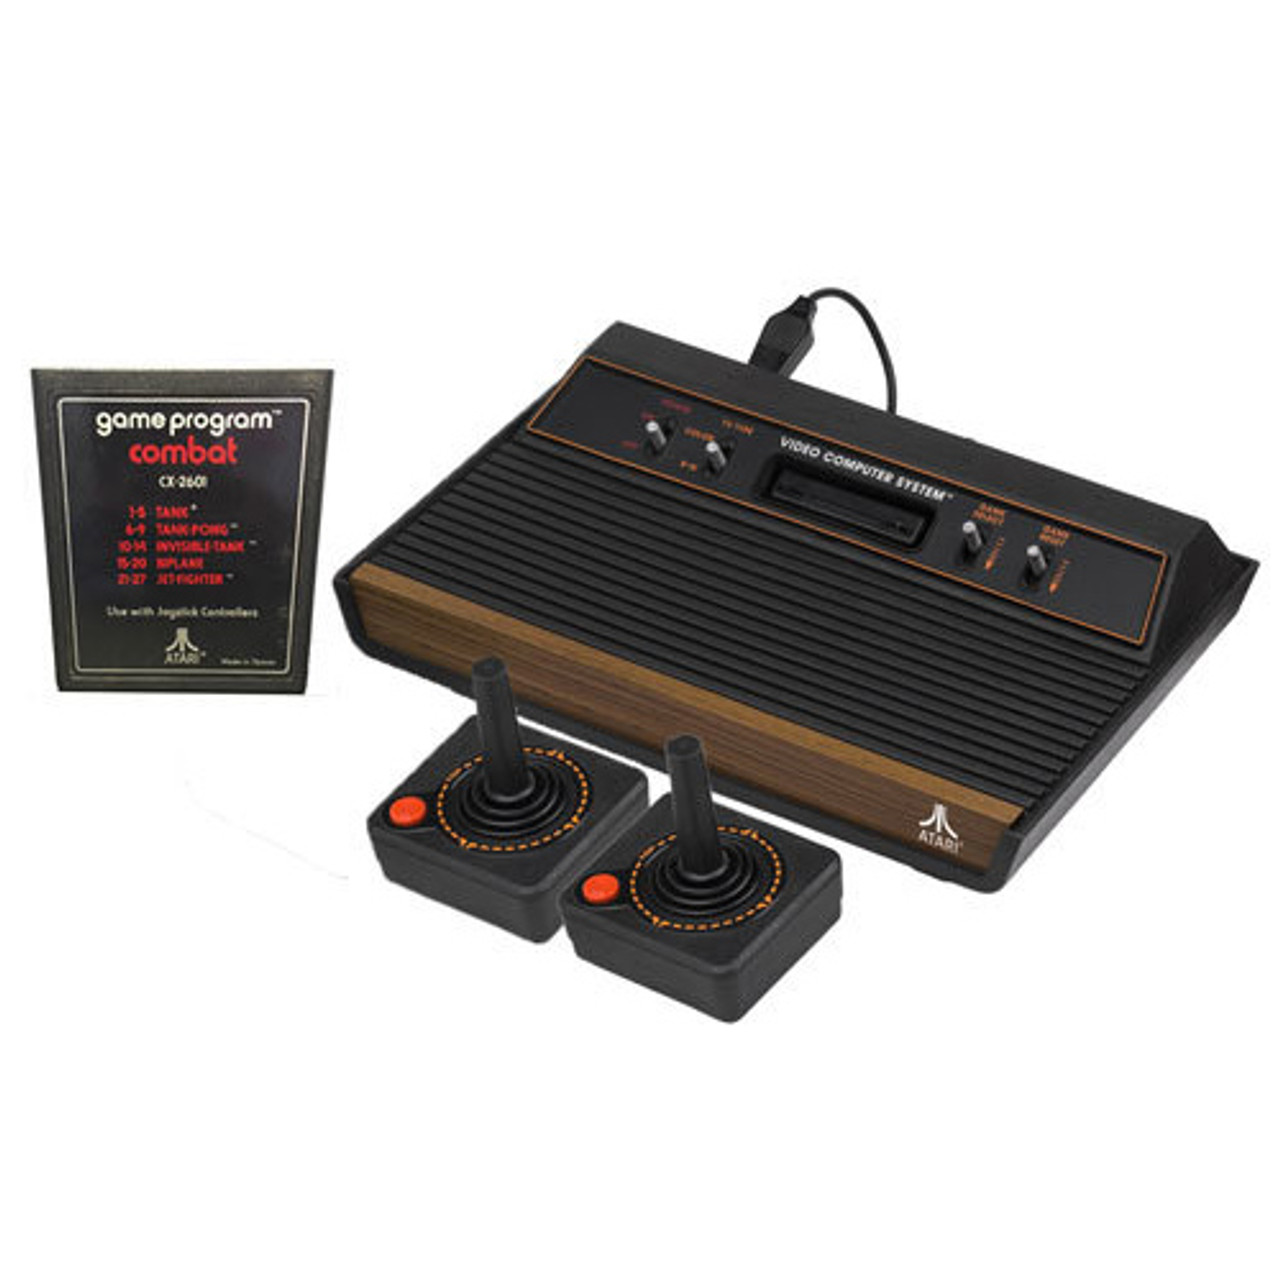 Atari 2600 2 Player Combat Game System Pak For Sale Dkoldies